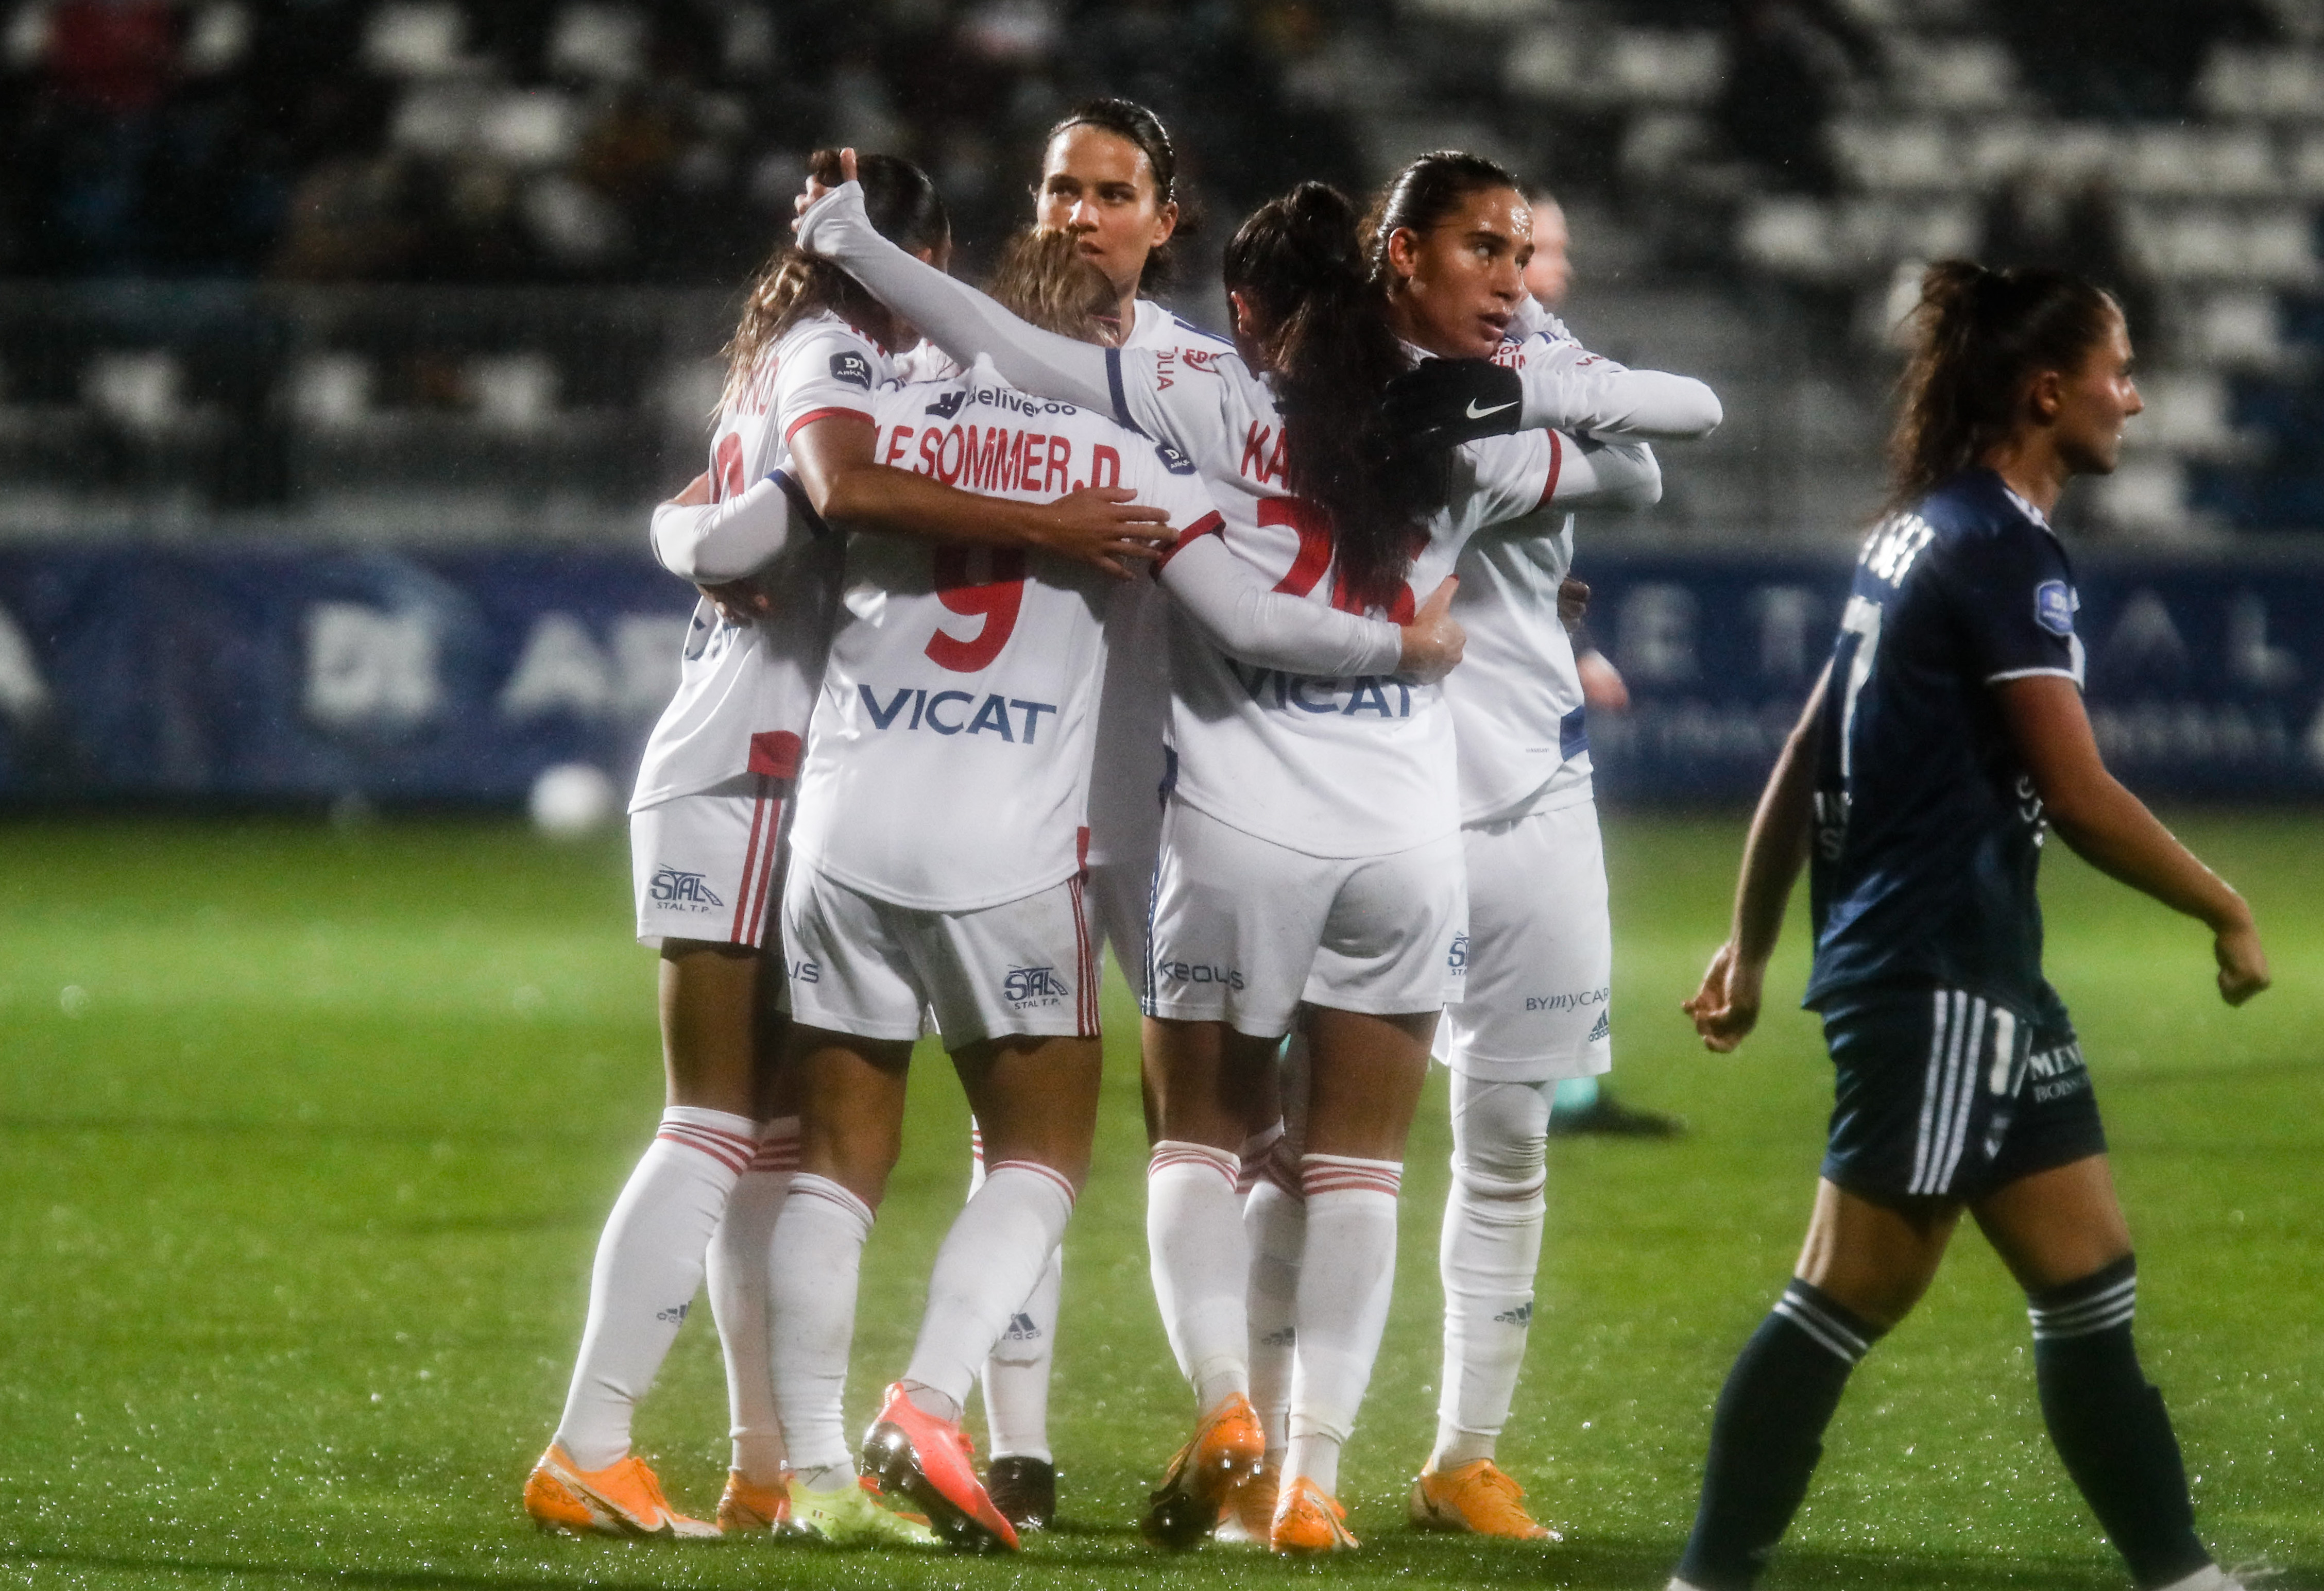 Olympique Lyonnais v Girondins de Bordeaux - D1 Arkema